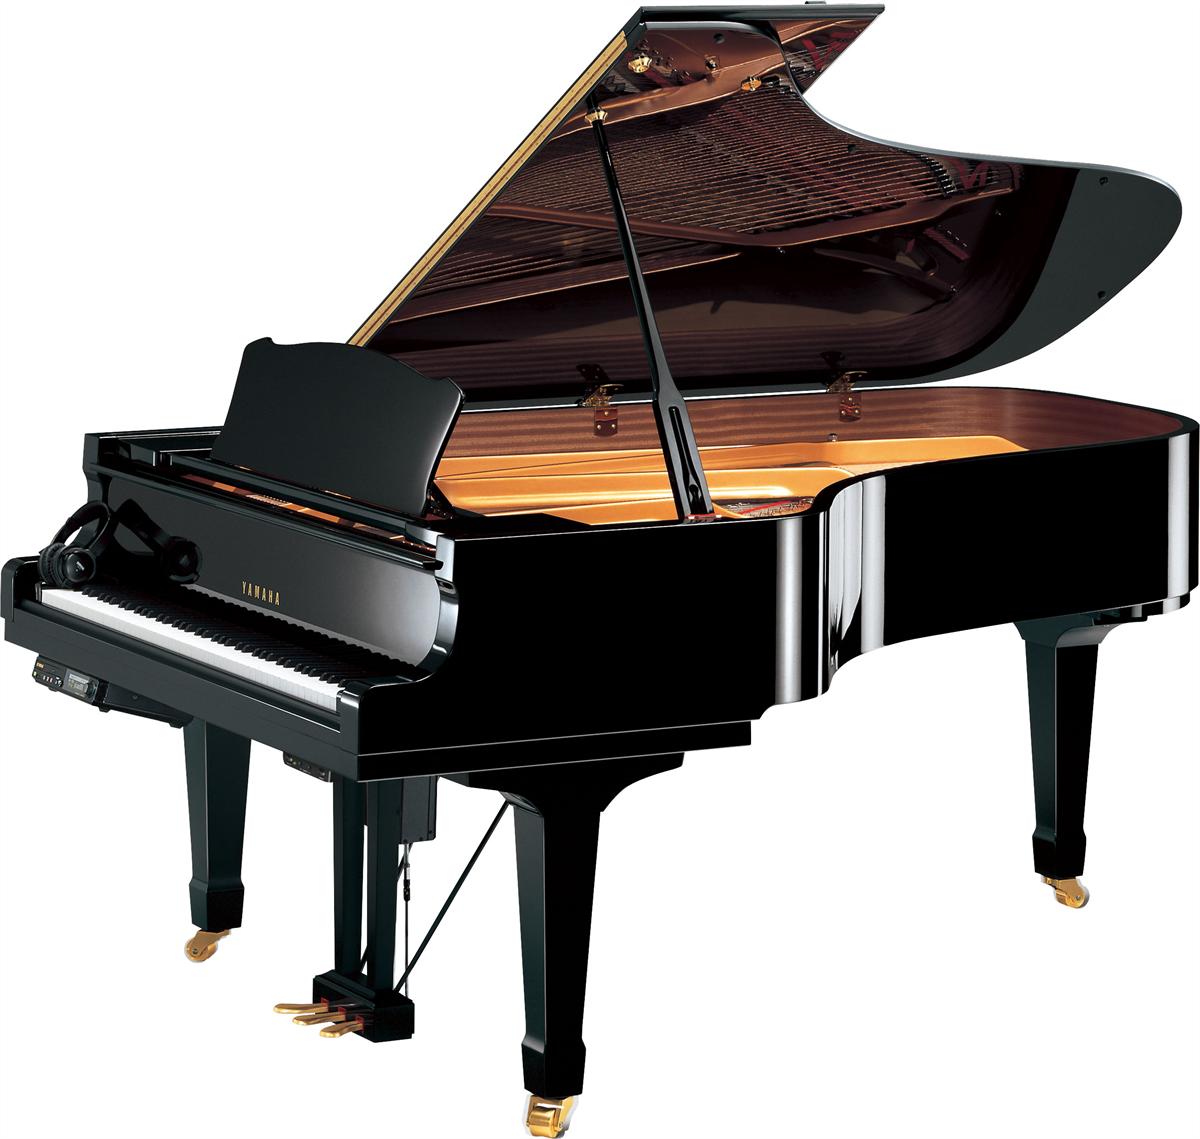 Yamaha DC7X ENSPIRE PRO Disklavier™ Grand Piano